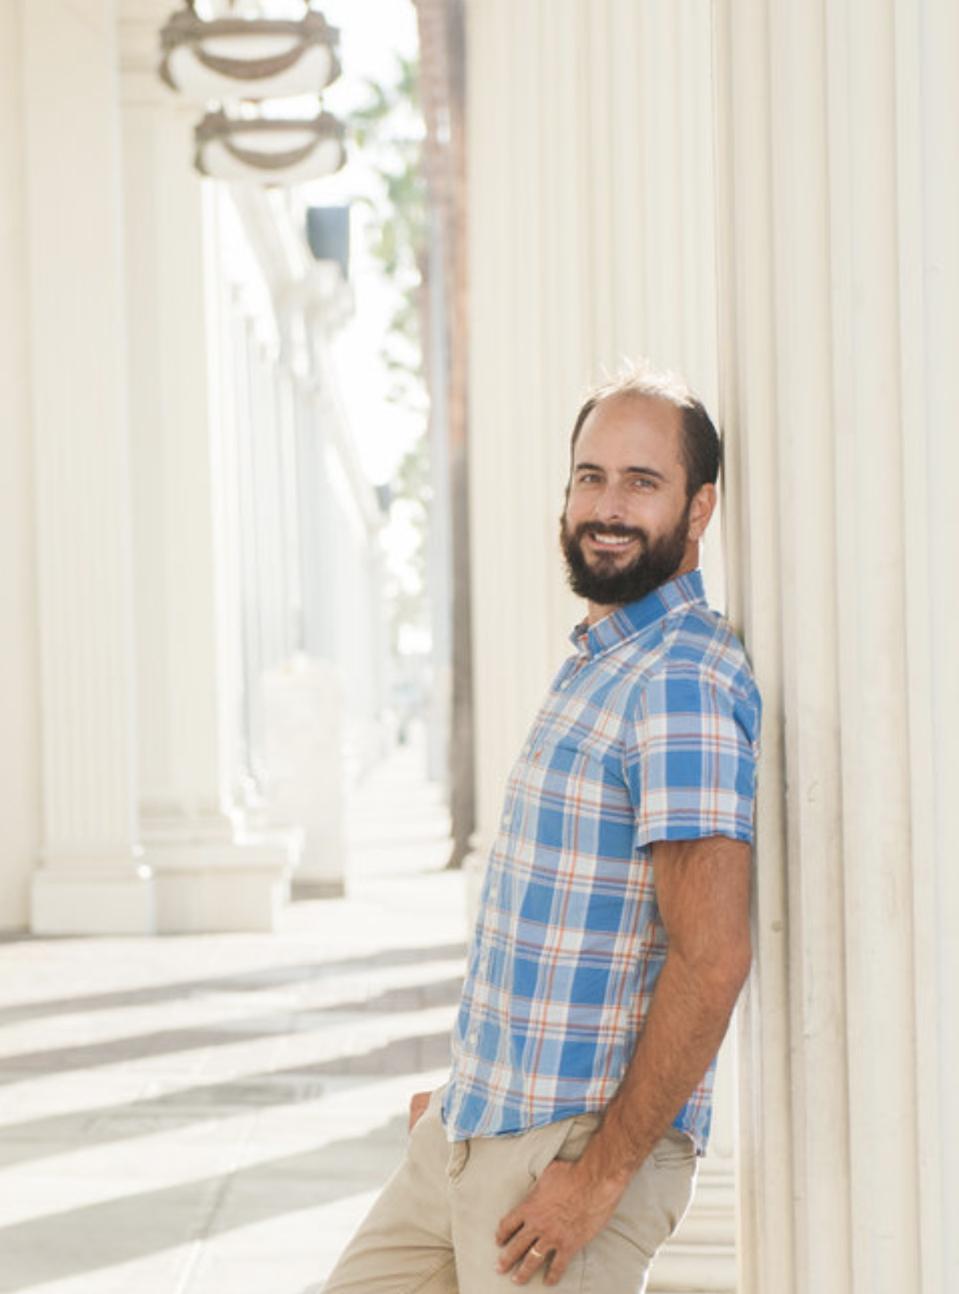 Floodlight Cofounder Nate Wyne